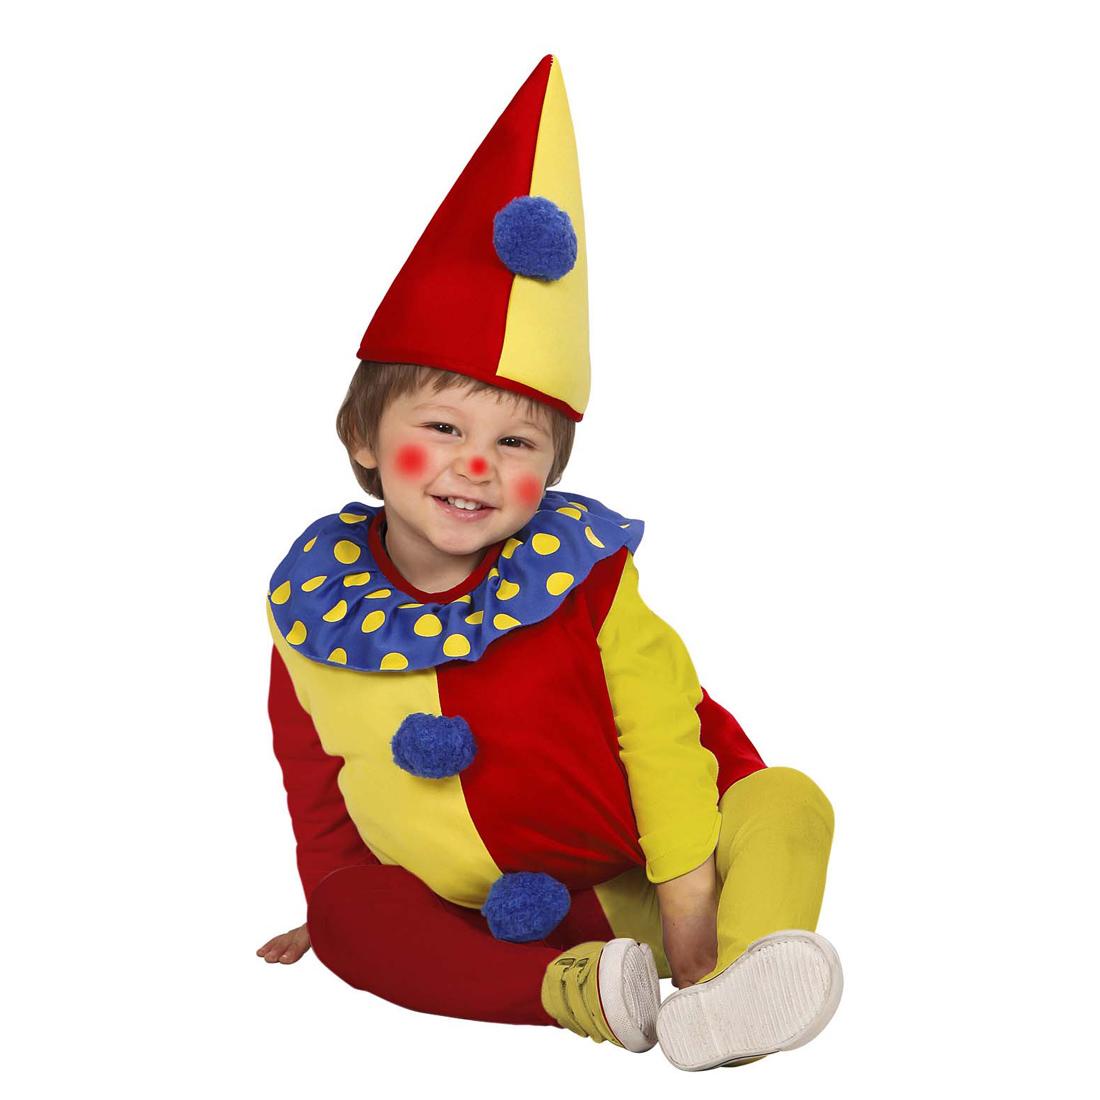 clownkost m kinder clown harlekin kost m baby clownskost m 90 104 cm 1 3 jahre ebay. Black Bedroom Furniture Sets. Home Design Ideas